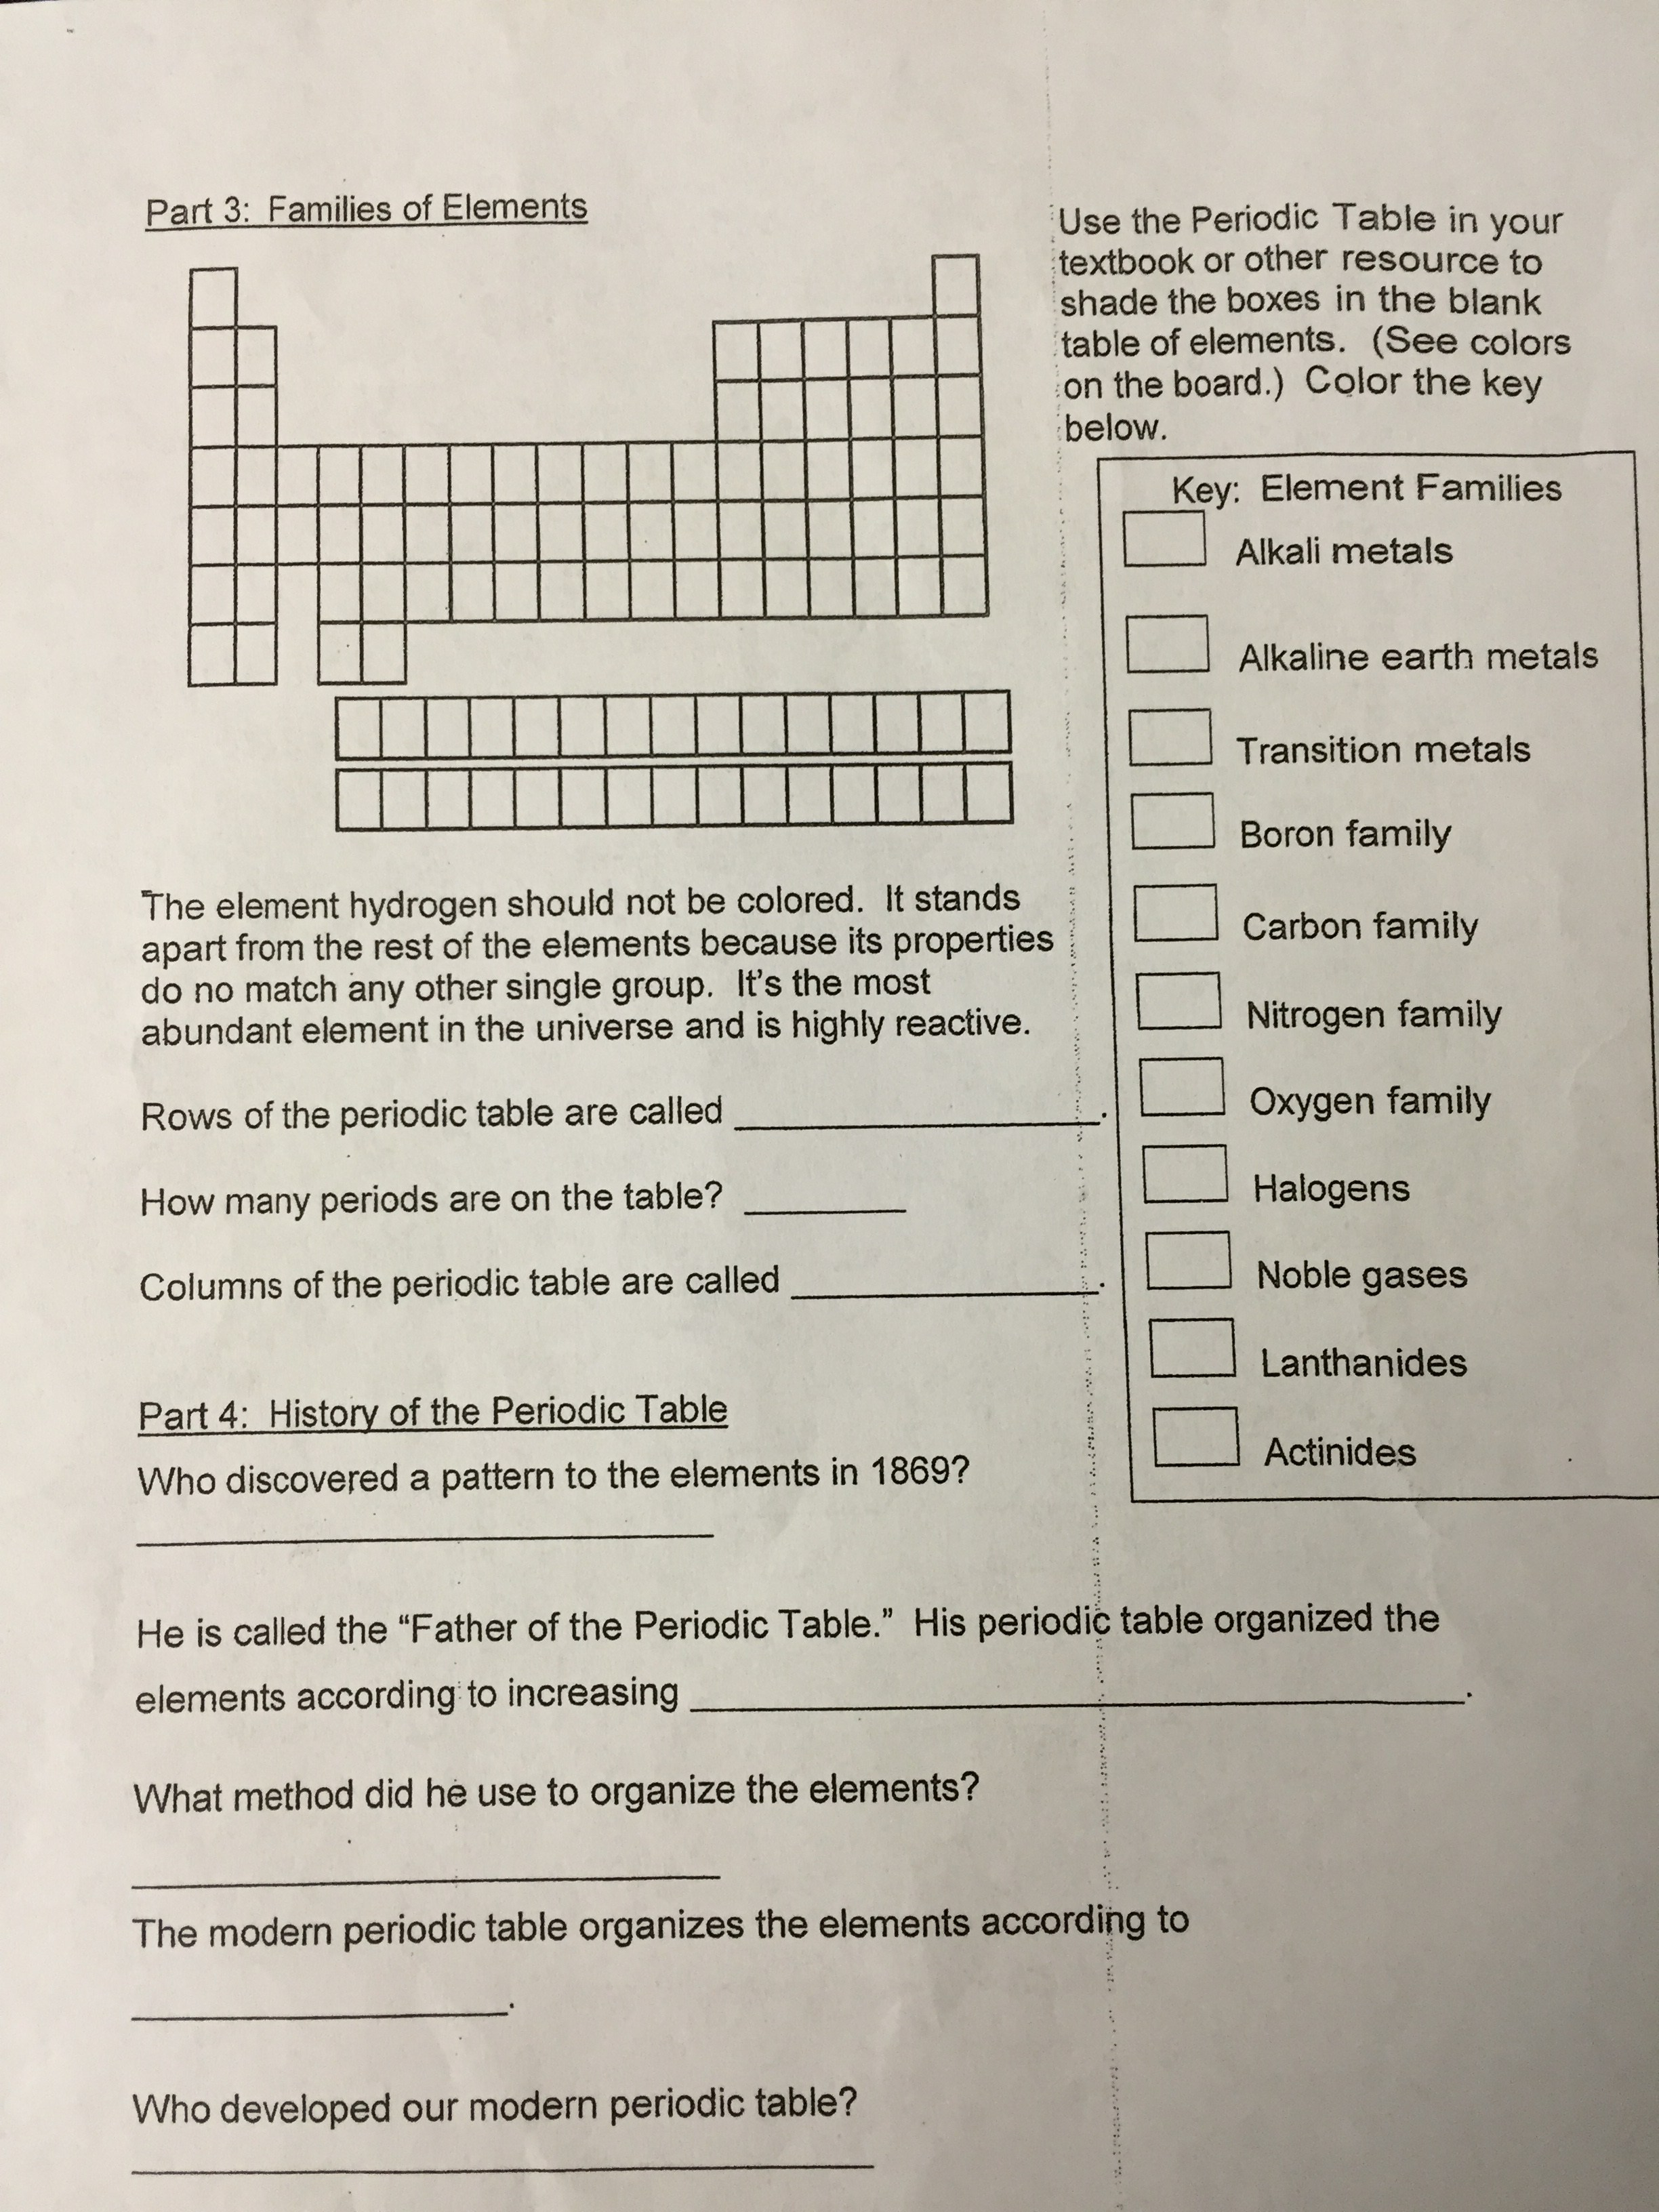 Get Organized A Periodic Table Webquest Answer Key